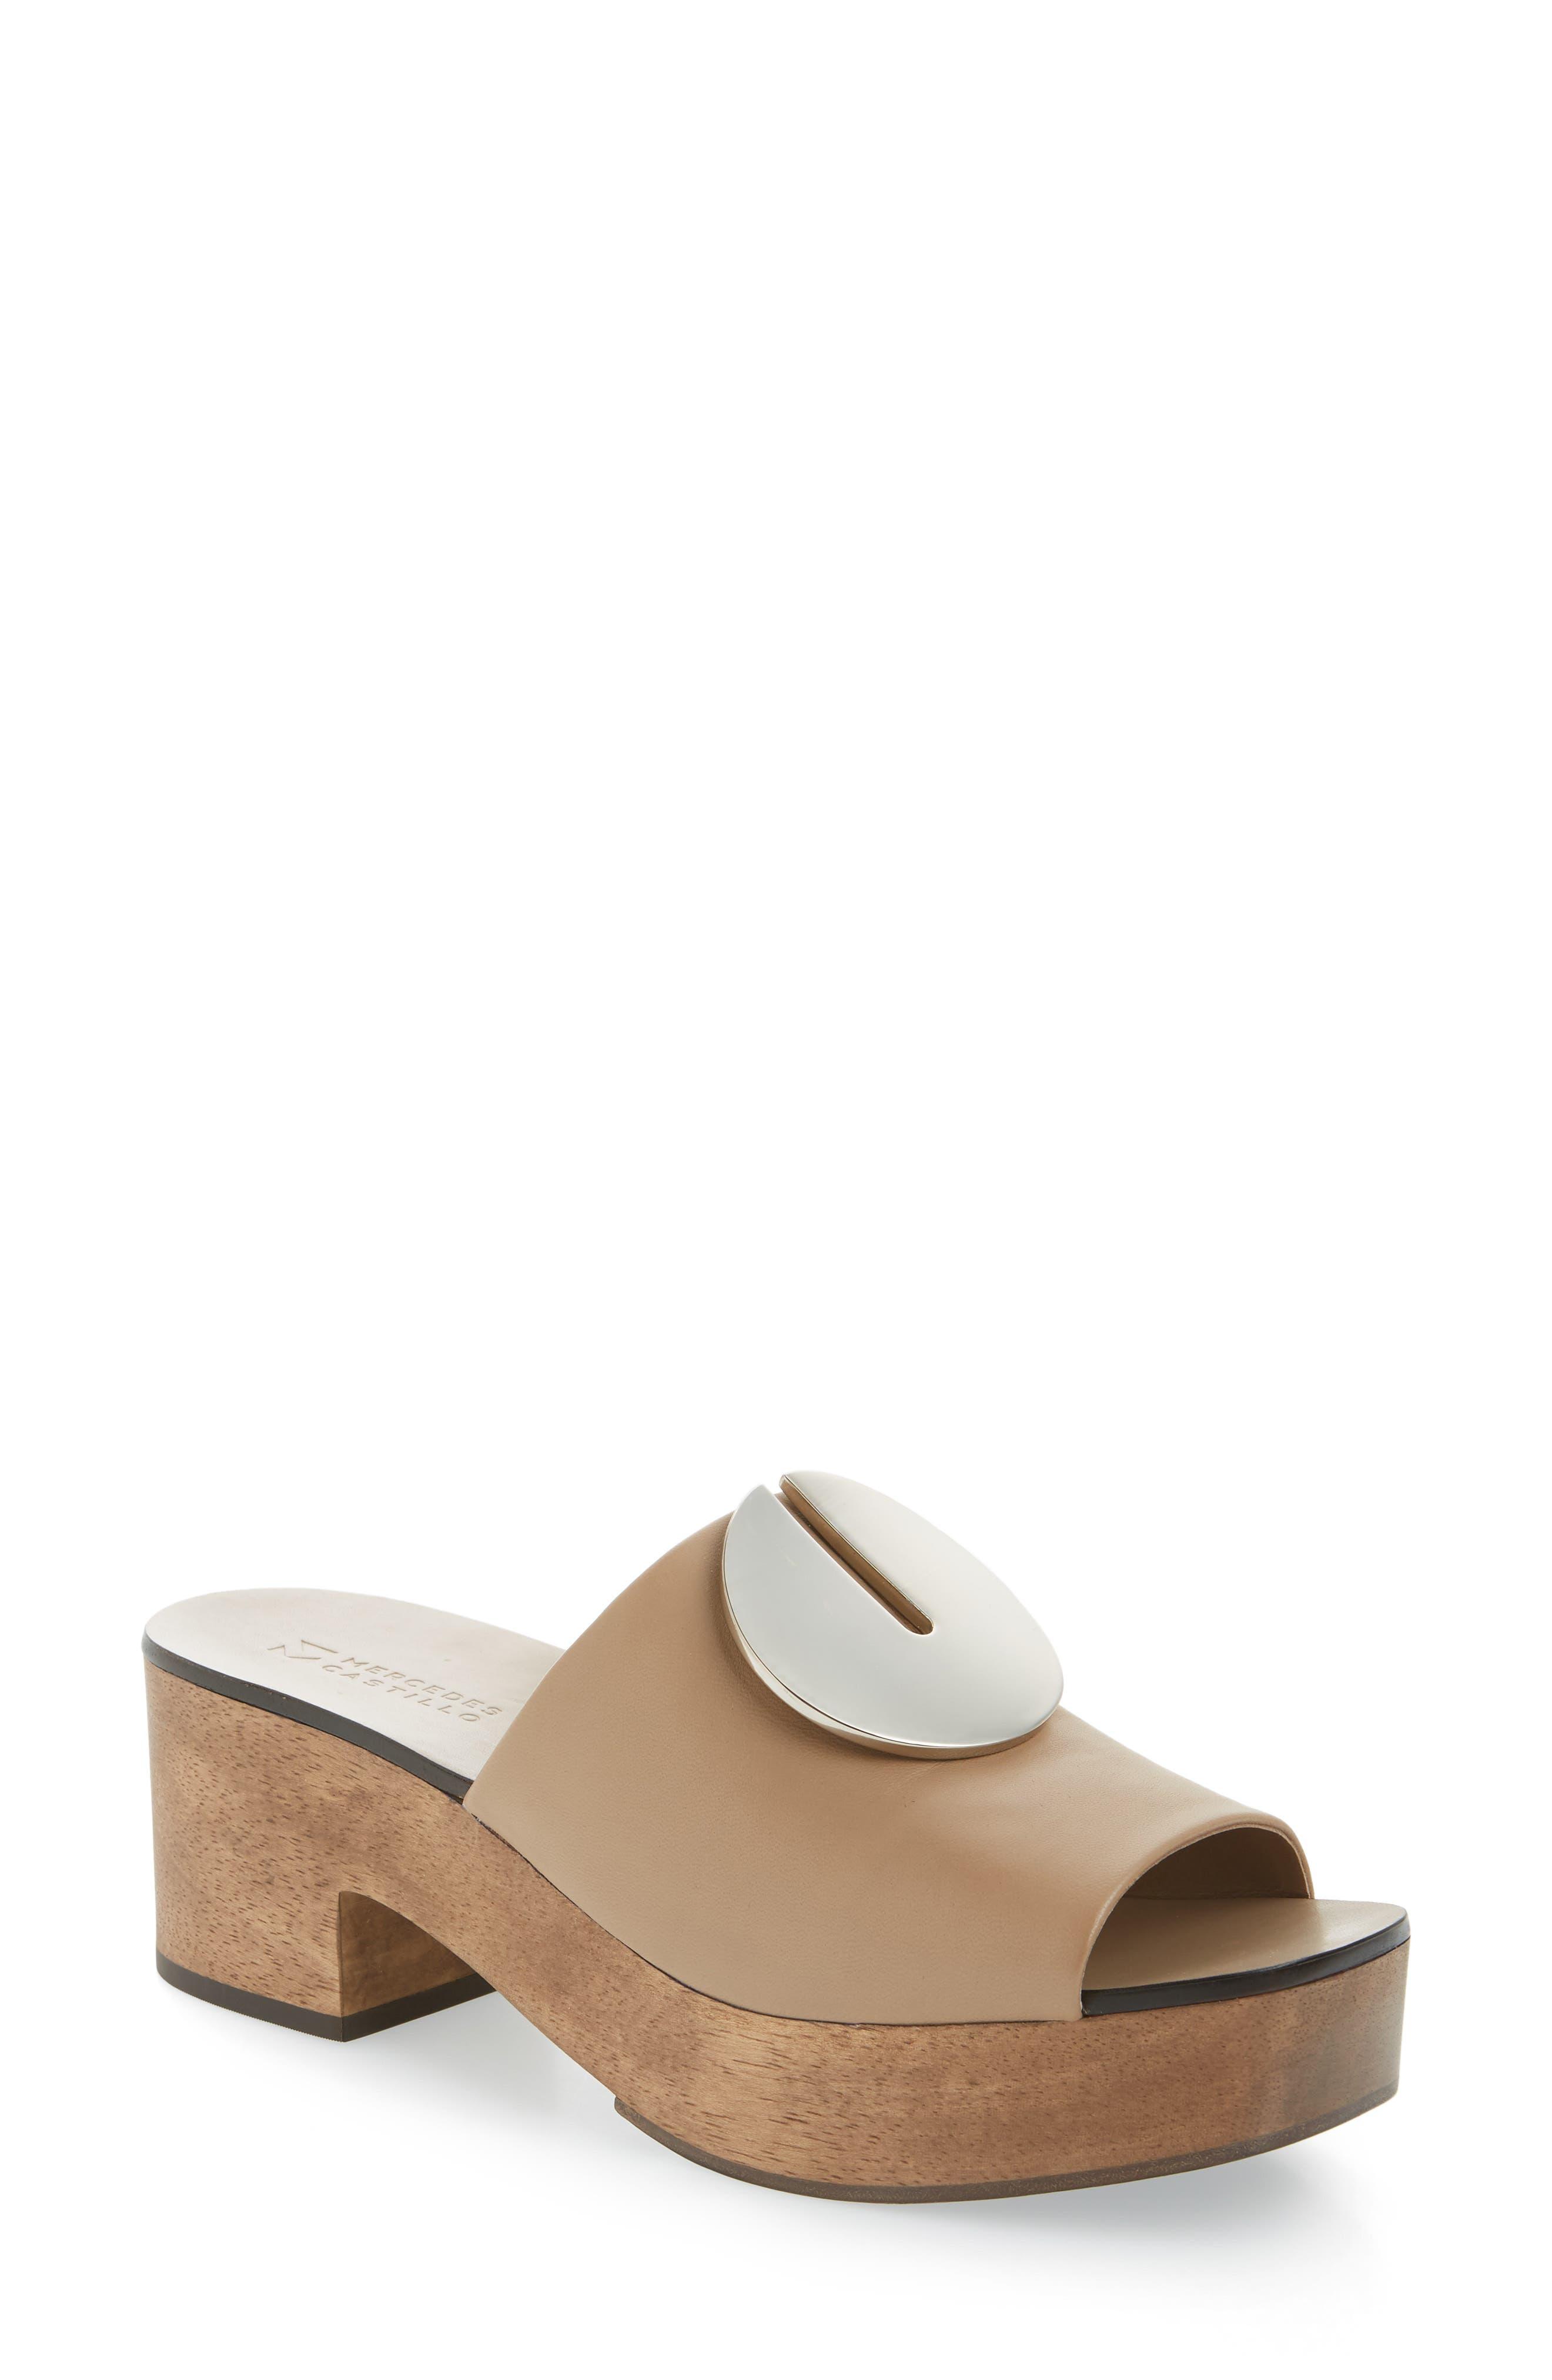 Kamilia Platform Sandal,                             Main thumbnail 1, color,